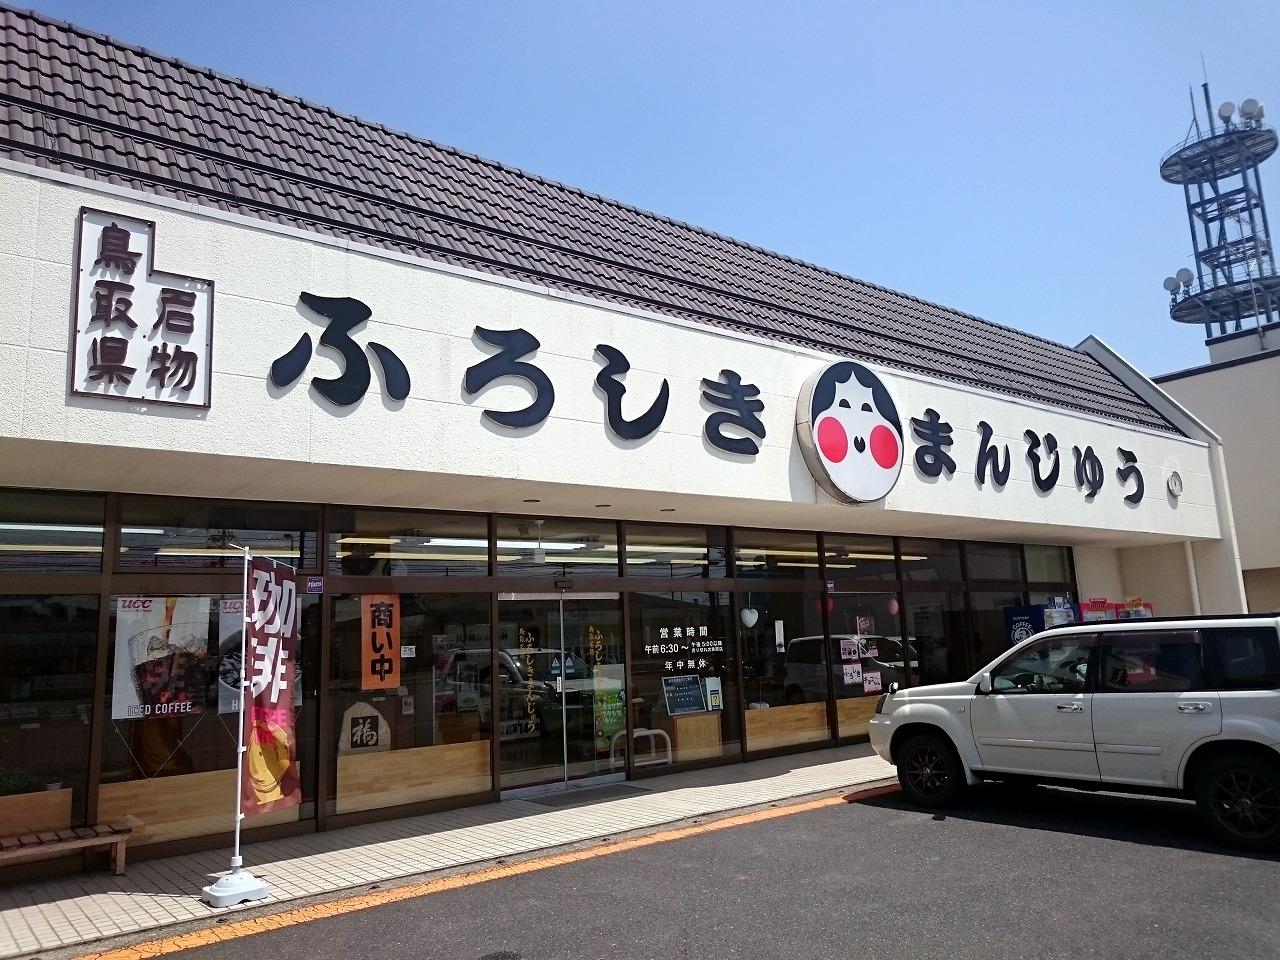 20150501-05_FuroshikiSteamedBread-02.jpg